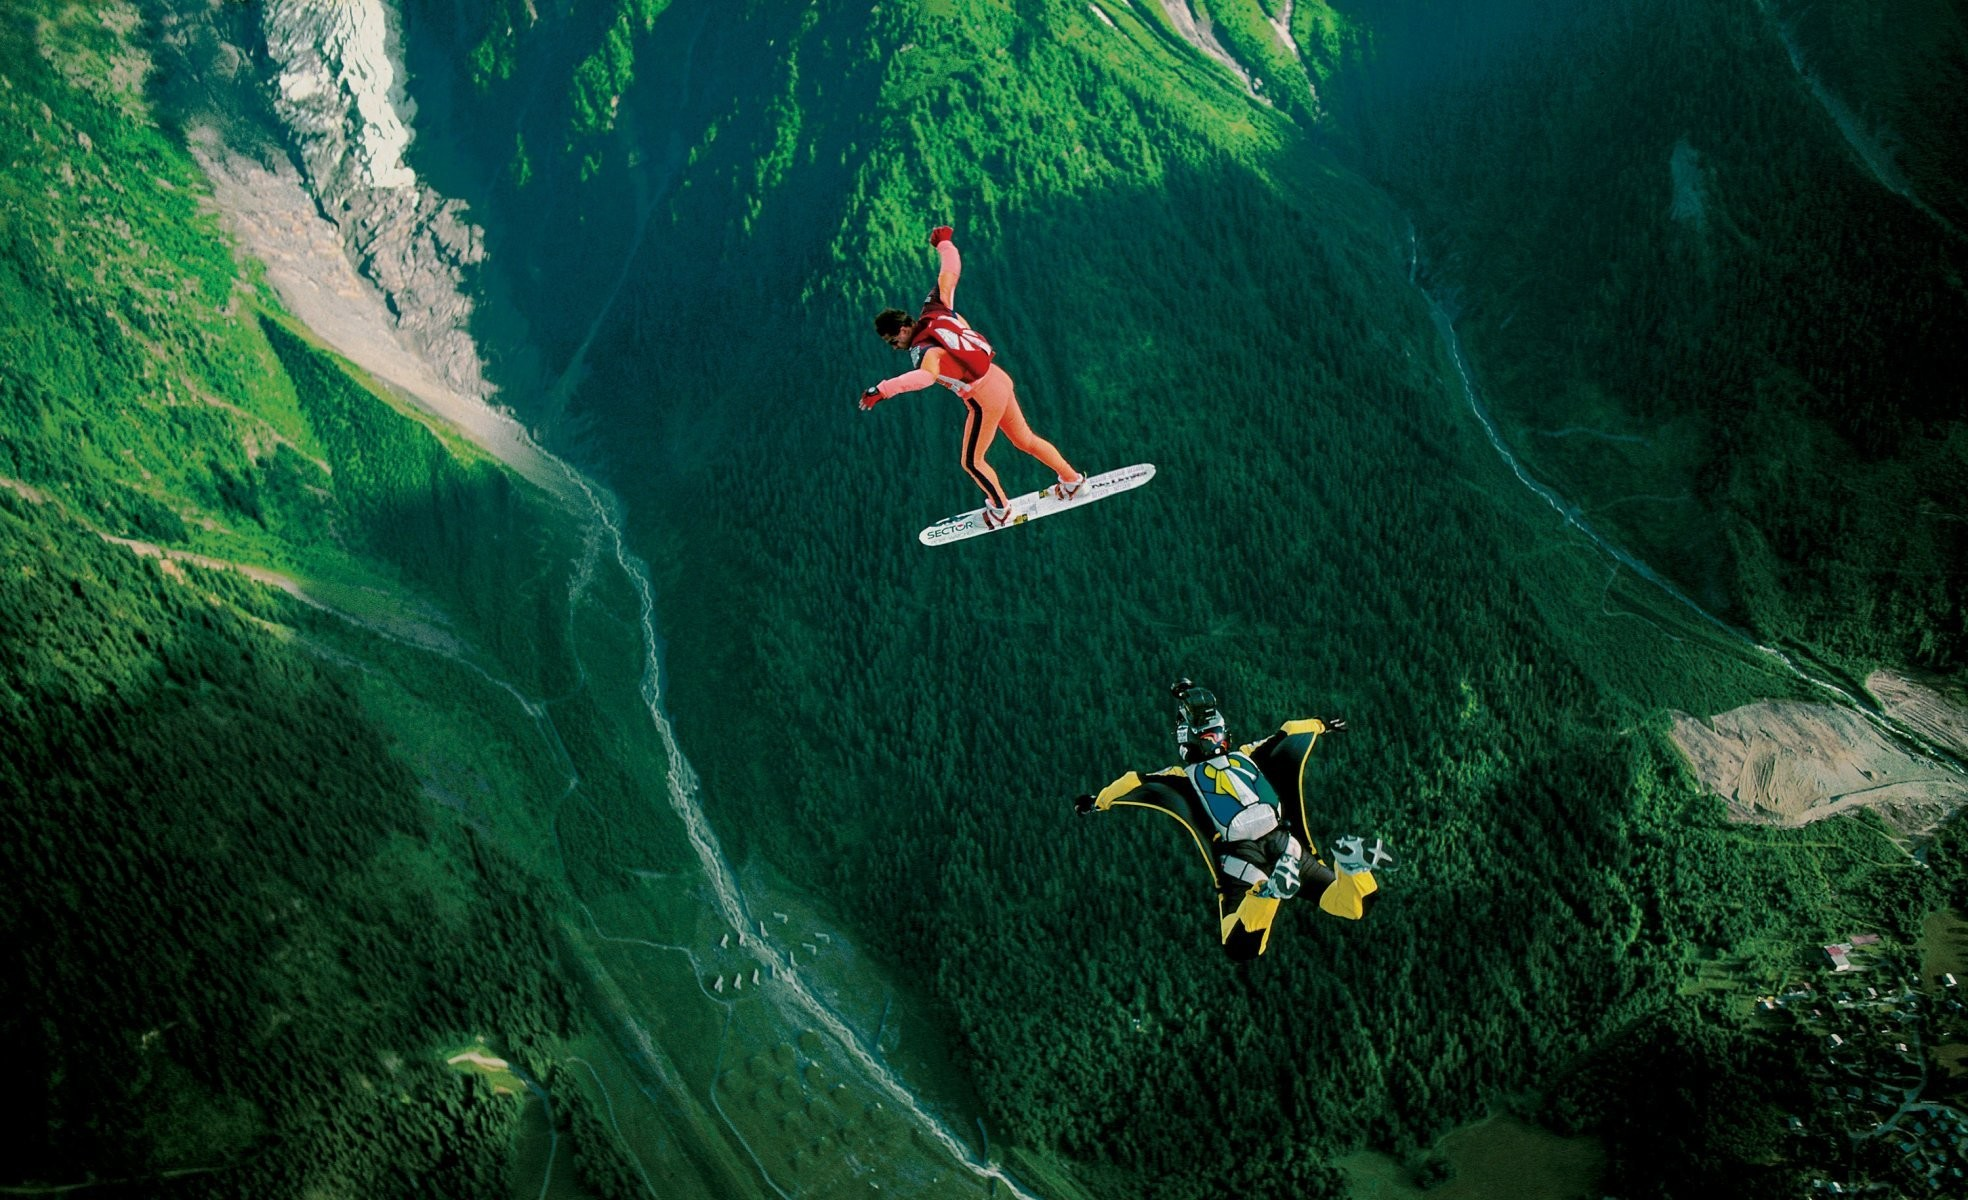 Sport Wallpaper: Extreme Sport Wallpapers ·① WallpaperTag